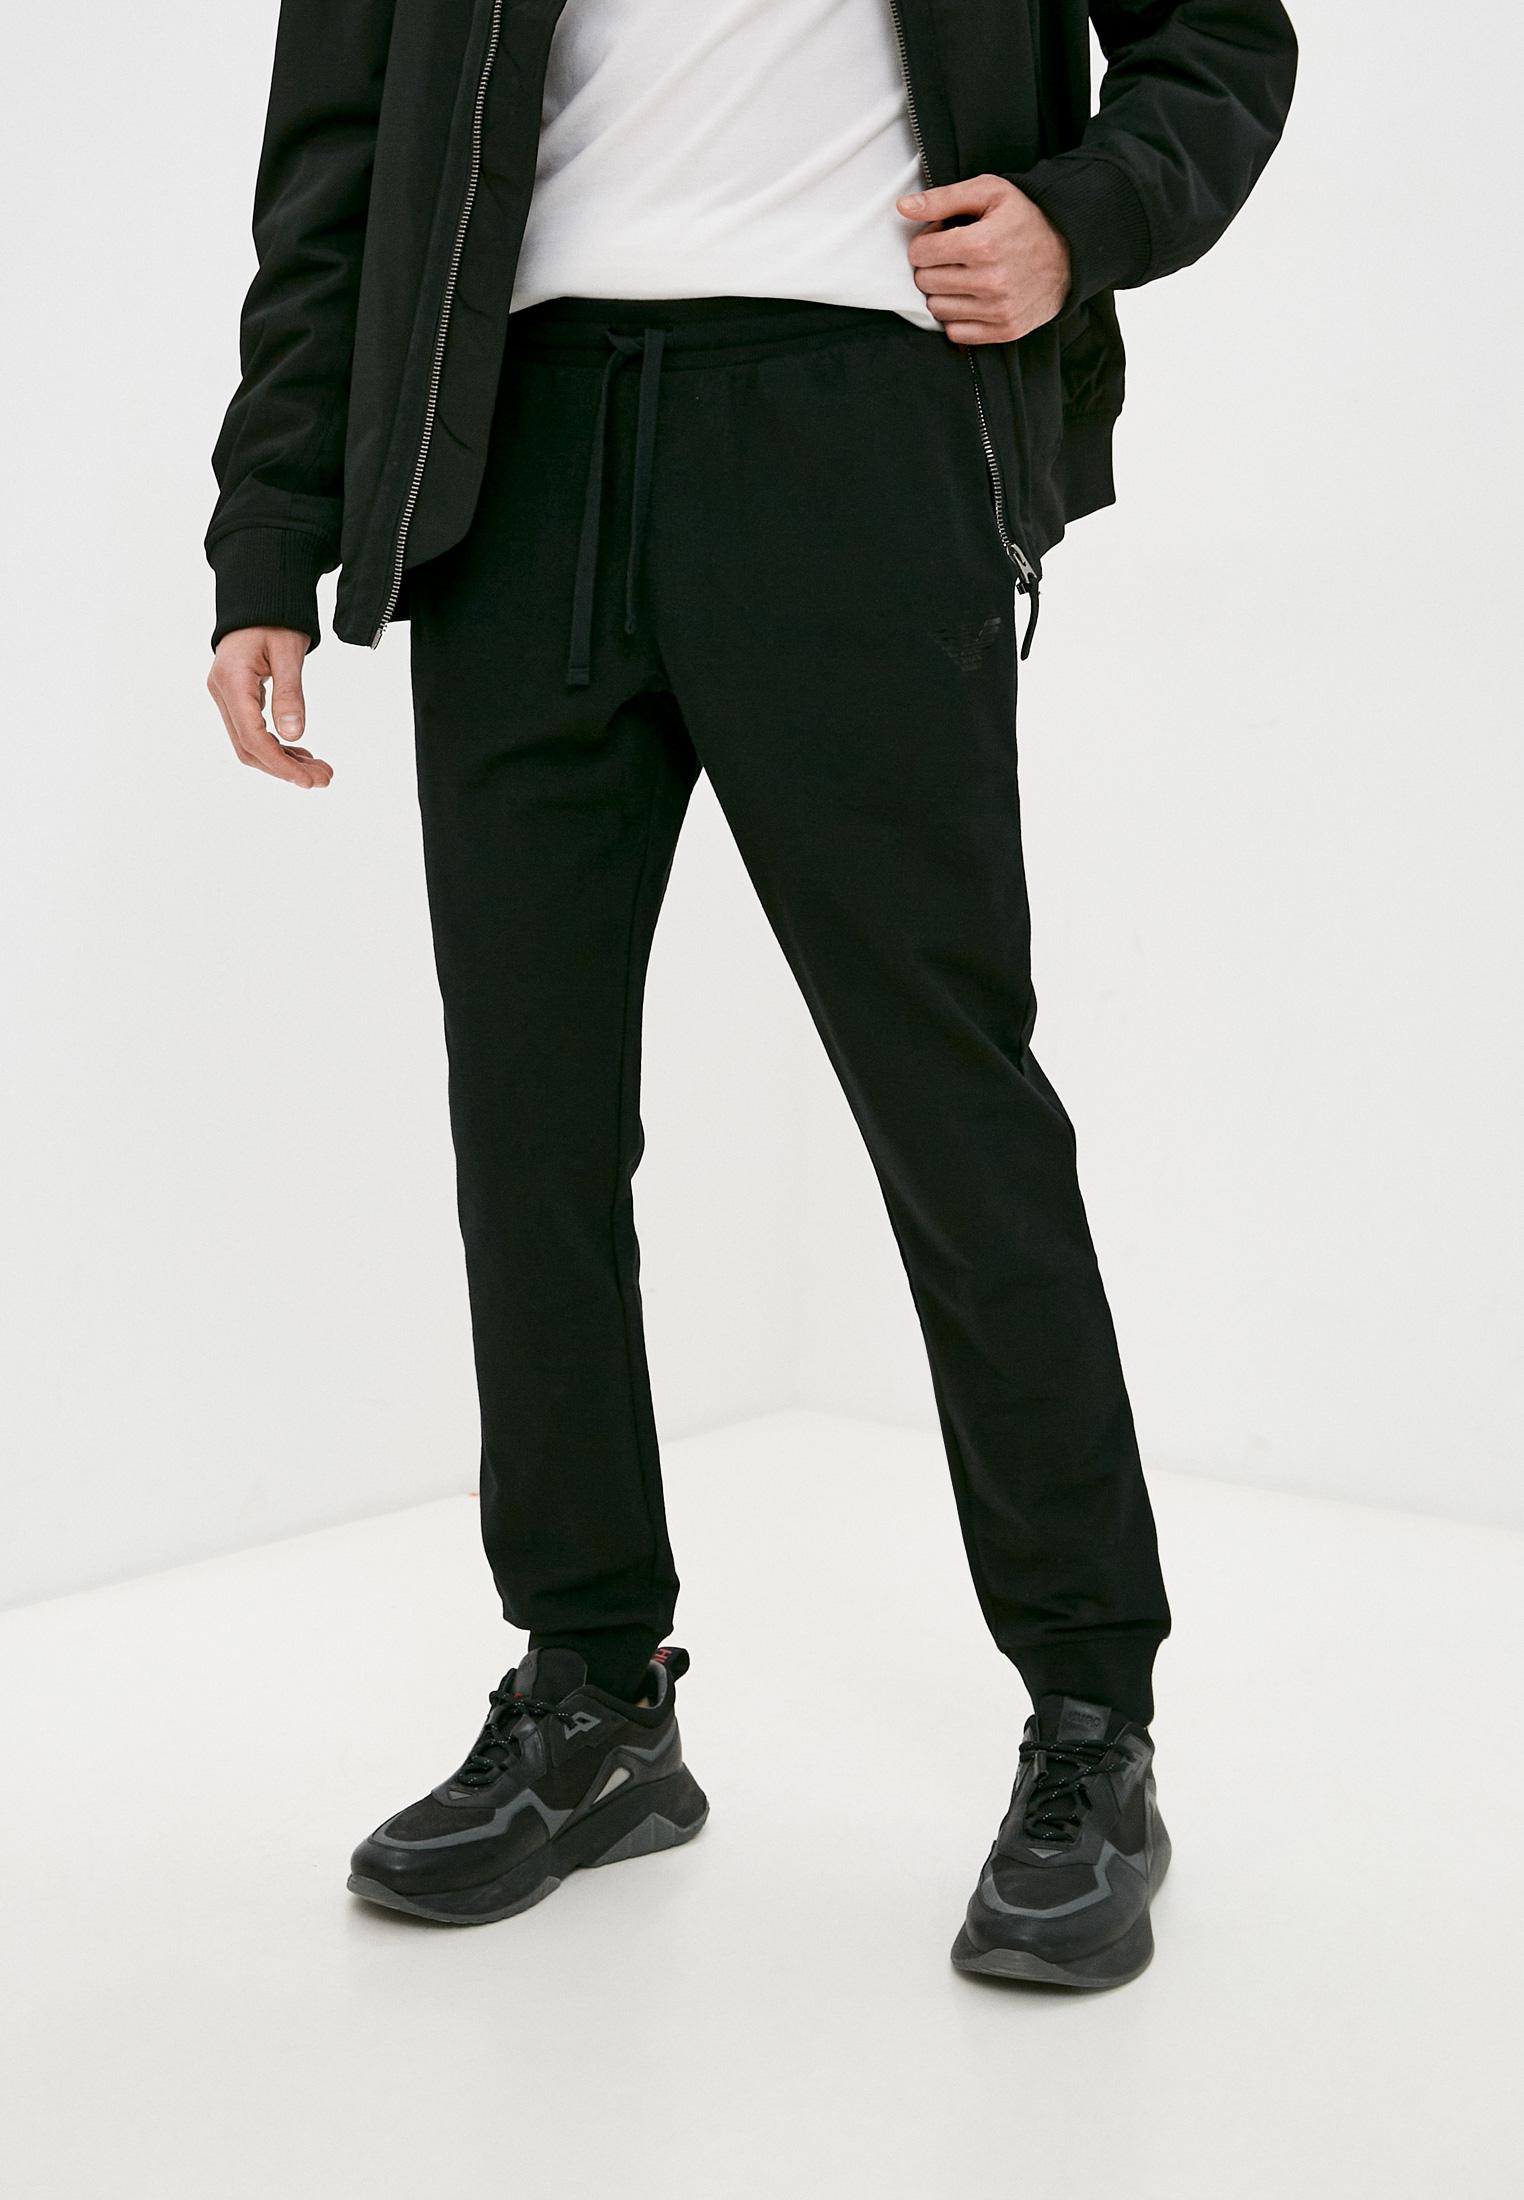 Мужские спортивные брюки Emporio Armani (Эмпорио Армани) 1116901p571